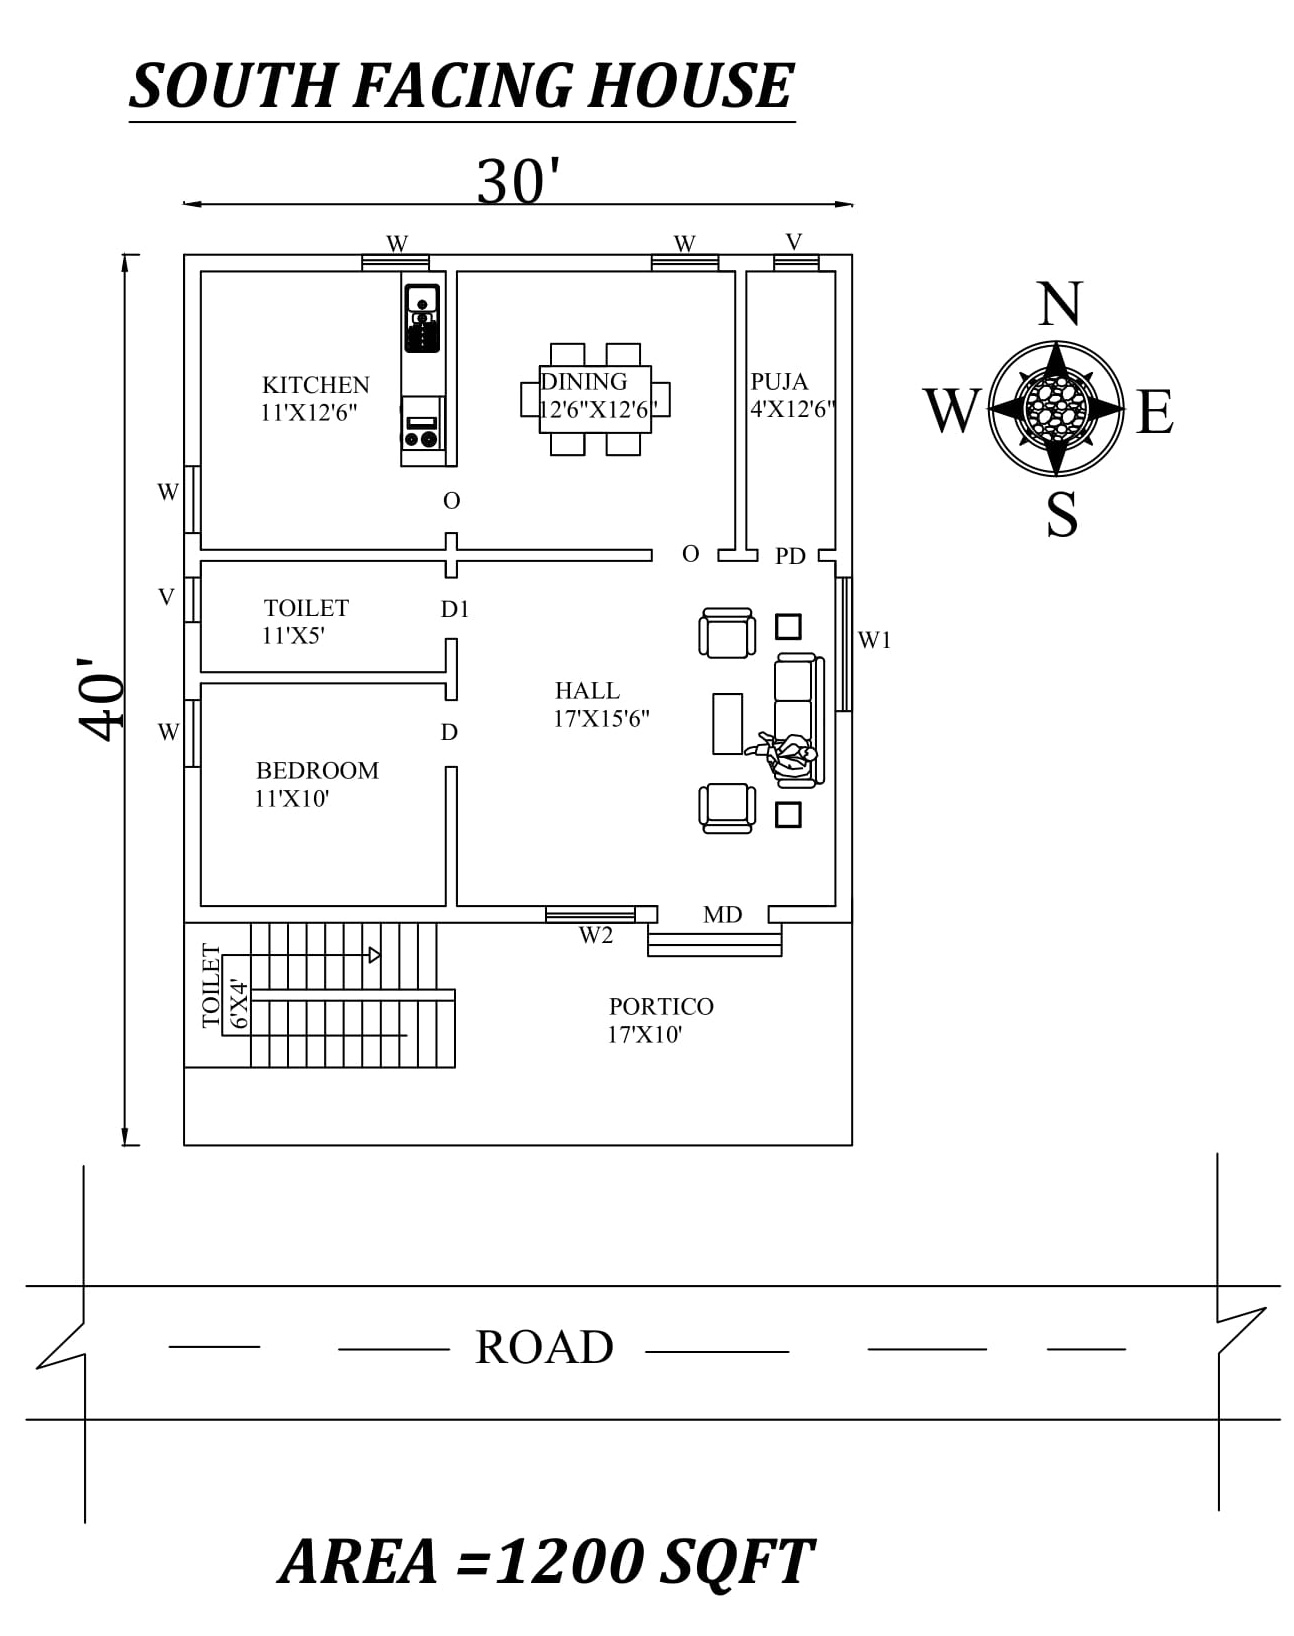 30 x40 1bhk south facing house plan as per vastu shastra